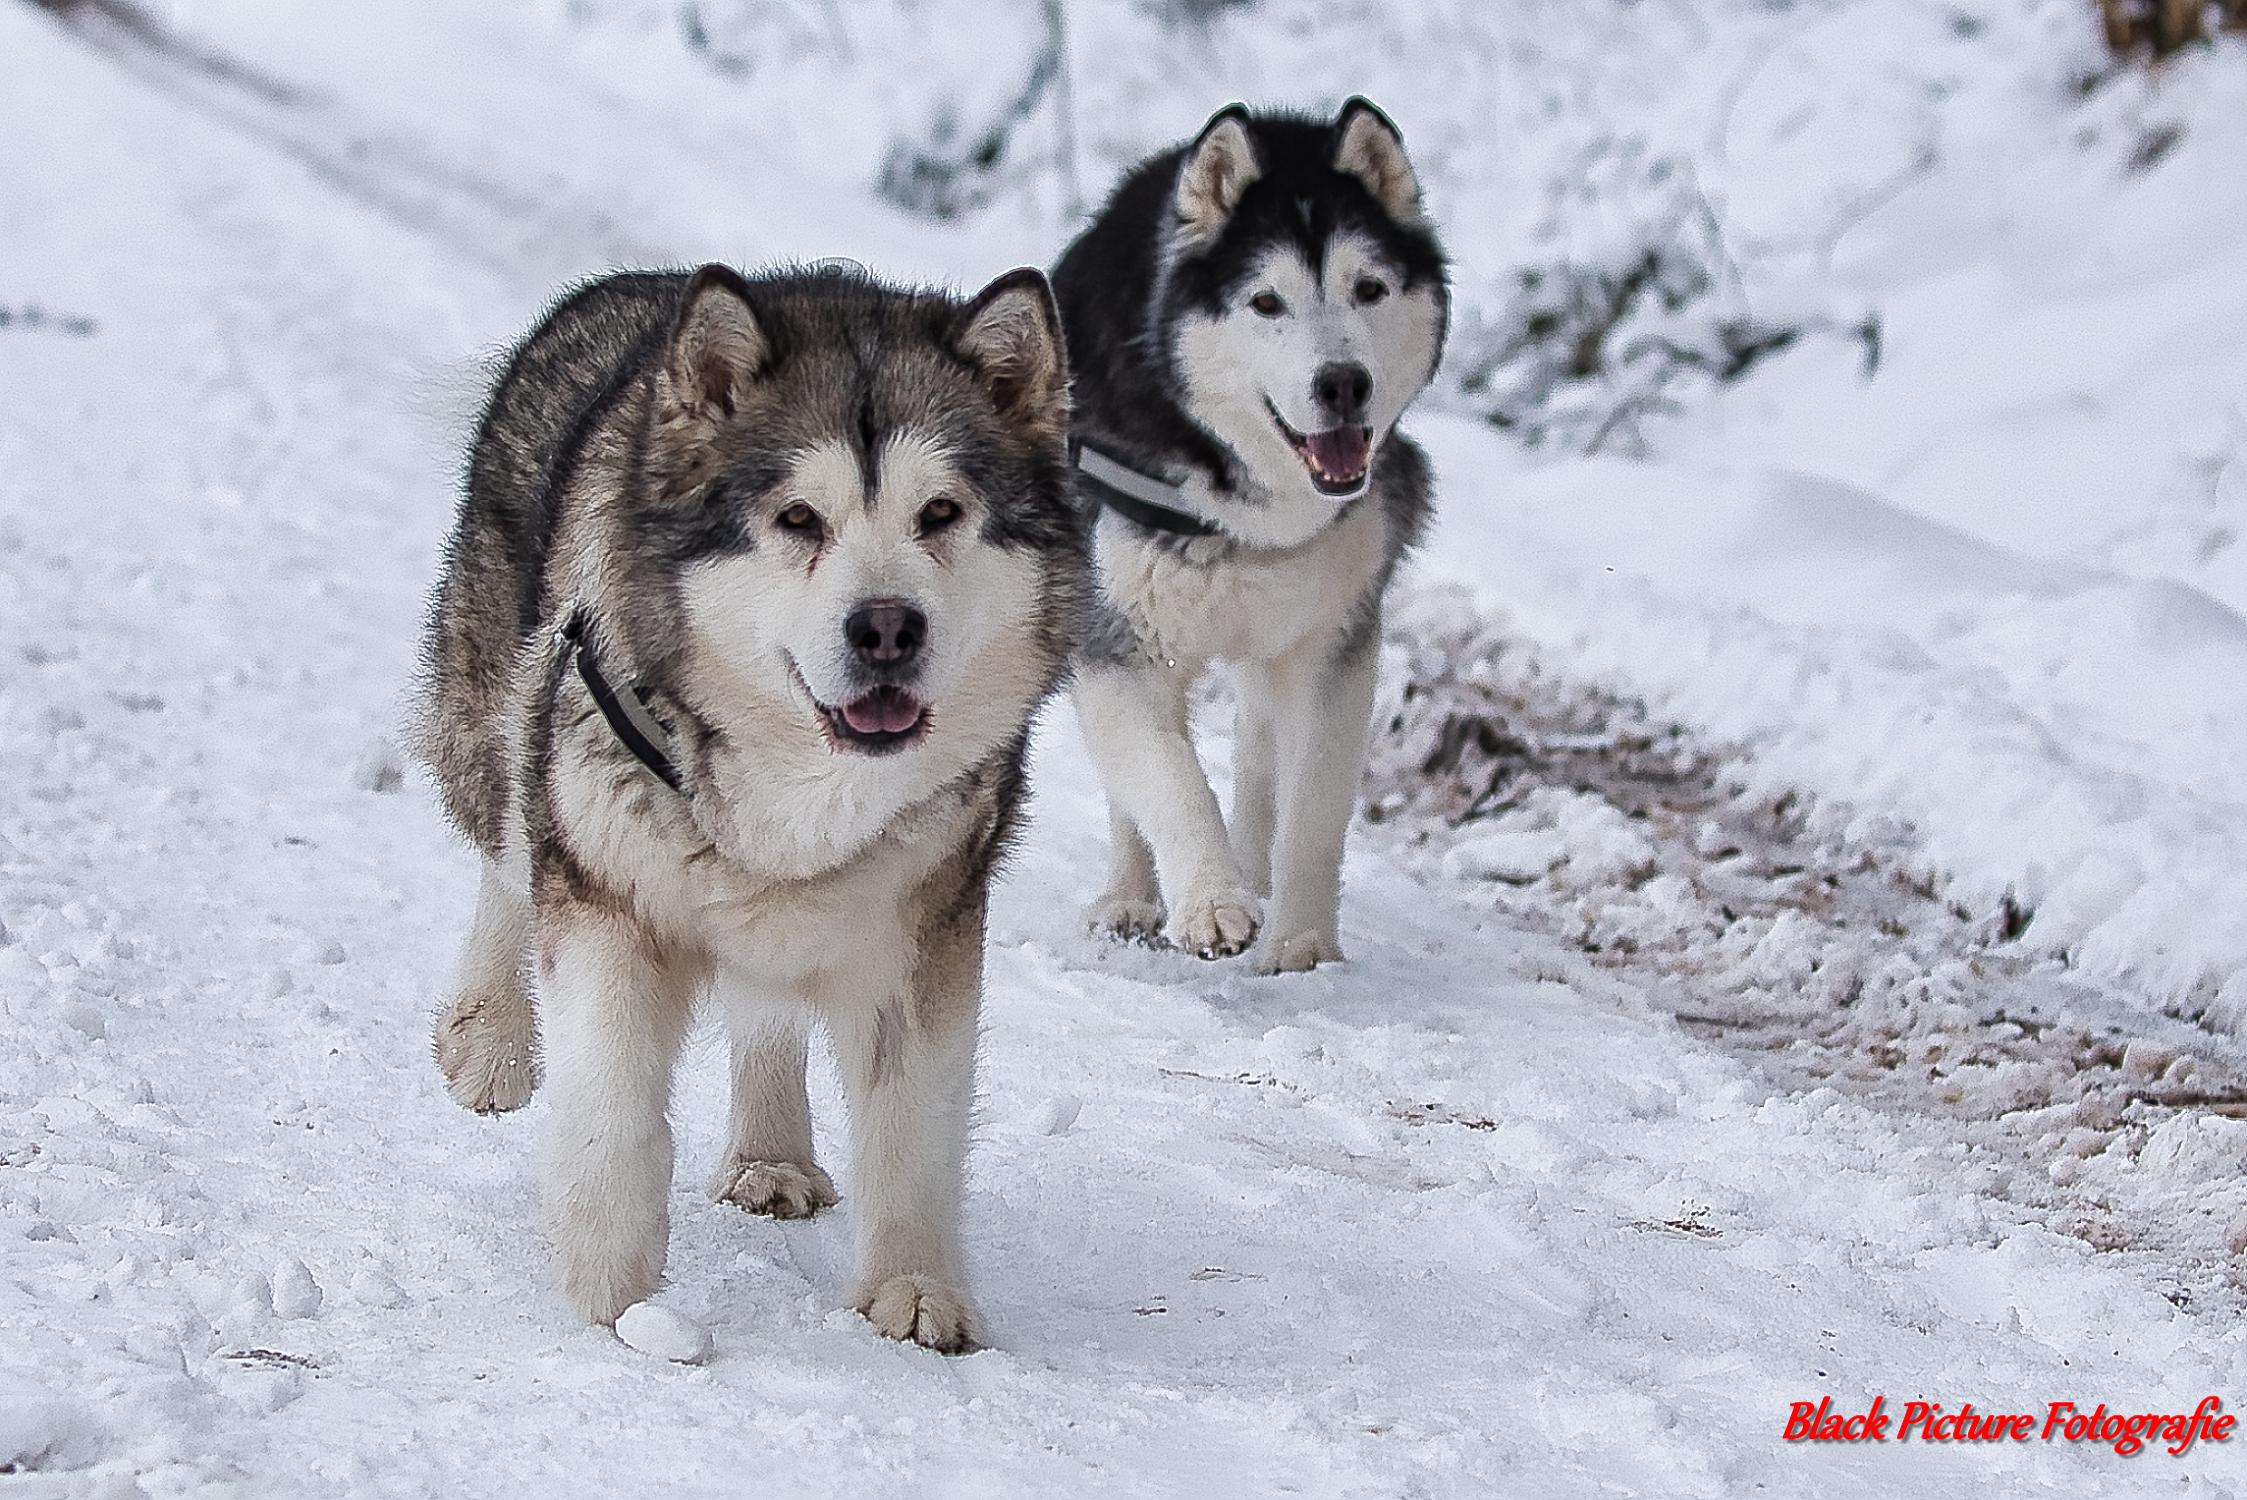 Hundefotografie, Hundeliebe, Dog, Hund, Dogphotography, Hundeleben, Dogs, Hunde, Doglover, Dogoftheday, Hundeblick, Doglife, Hundewelt, Doglove, Hundefoto, Hundemodel, Hundefreunde, Tierfotografie, Alaskan Malamute, Black Picture Fotografie